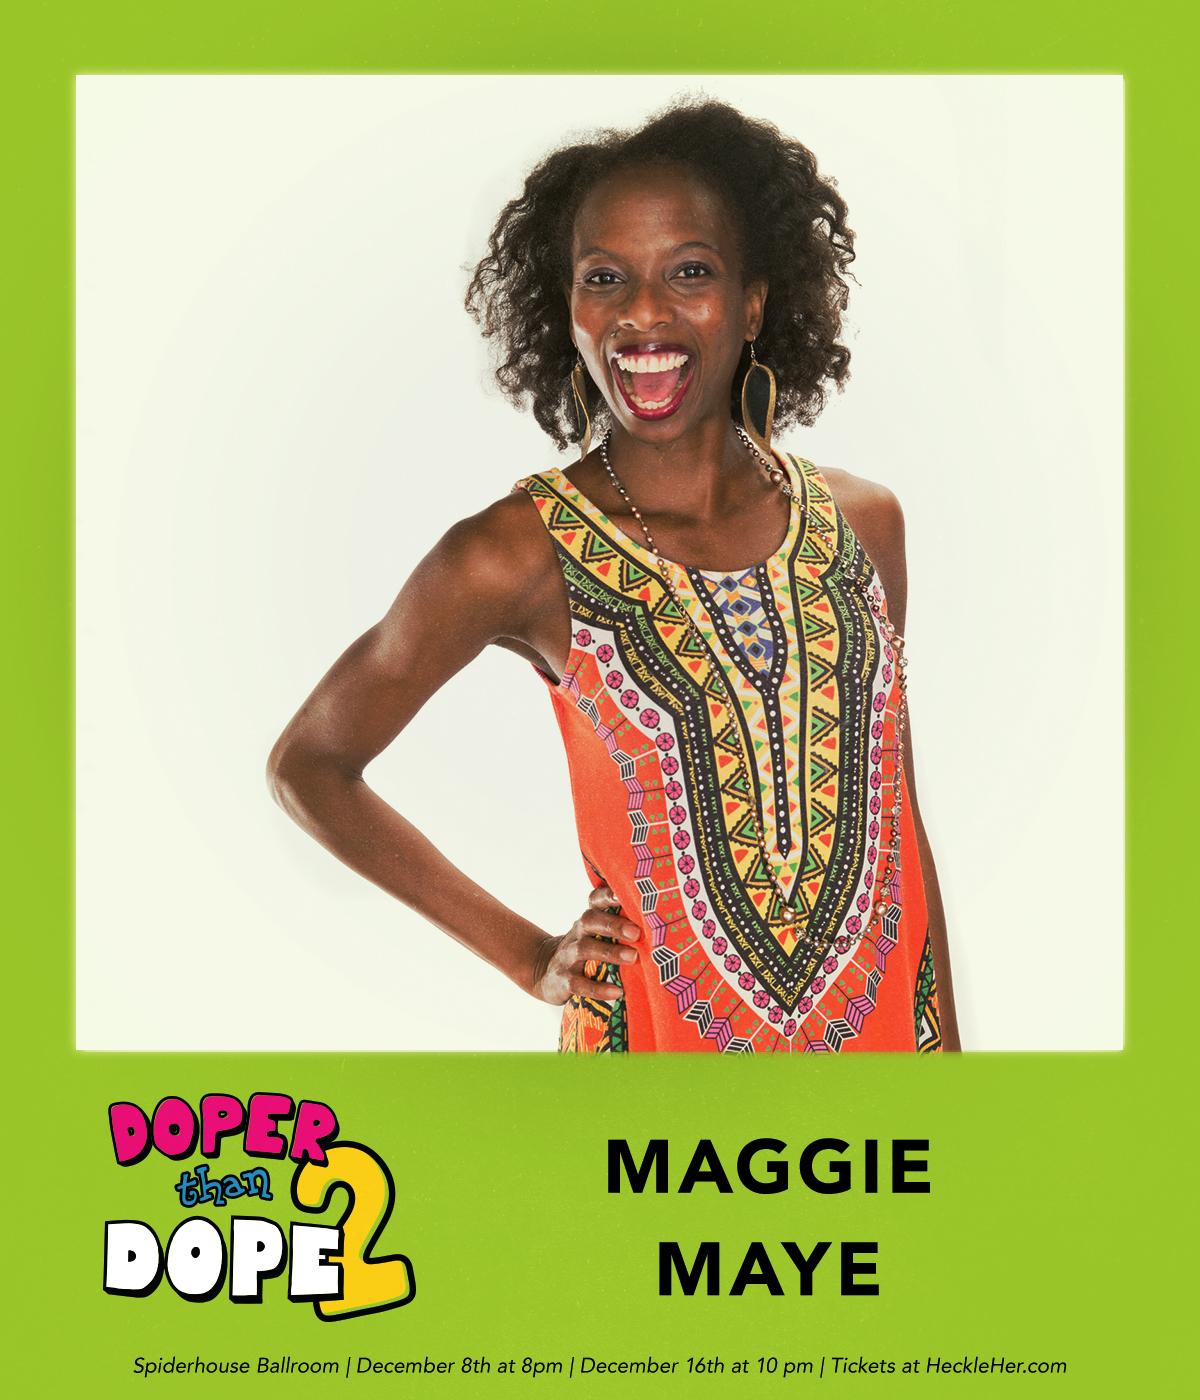 MaggieMayeFeature.jpg